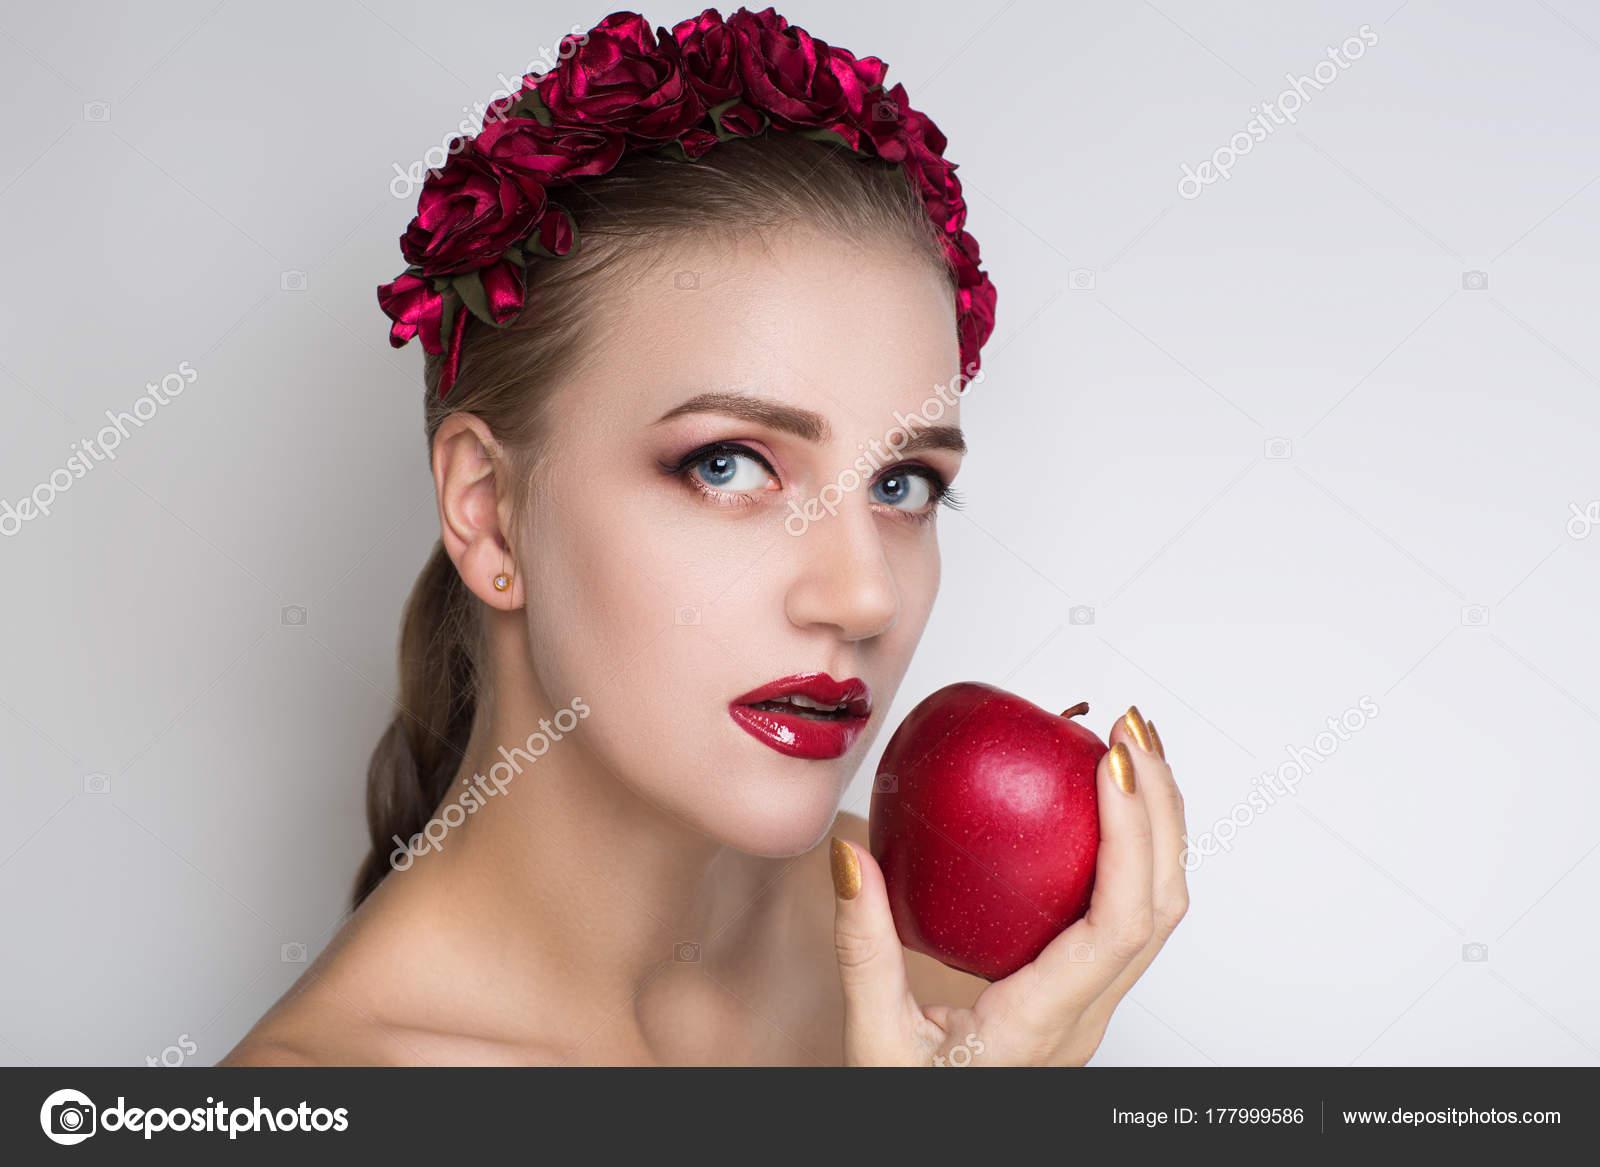 a7020e676c9 Γυναίκα κόκκινο μήλο — Φωτογραφία Αρχείου © OlgaOsa #177999586